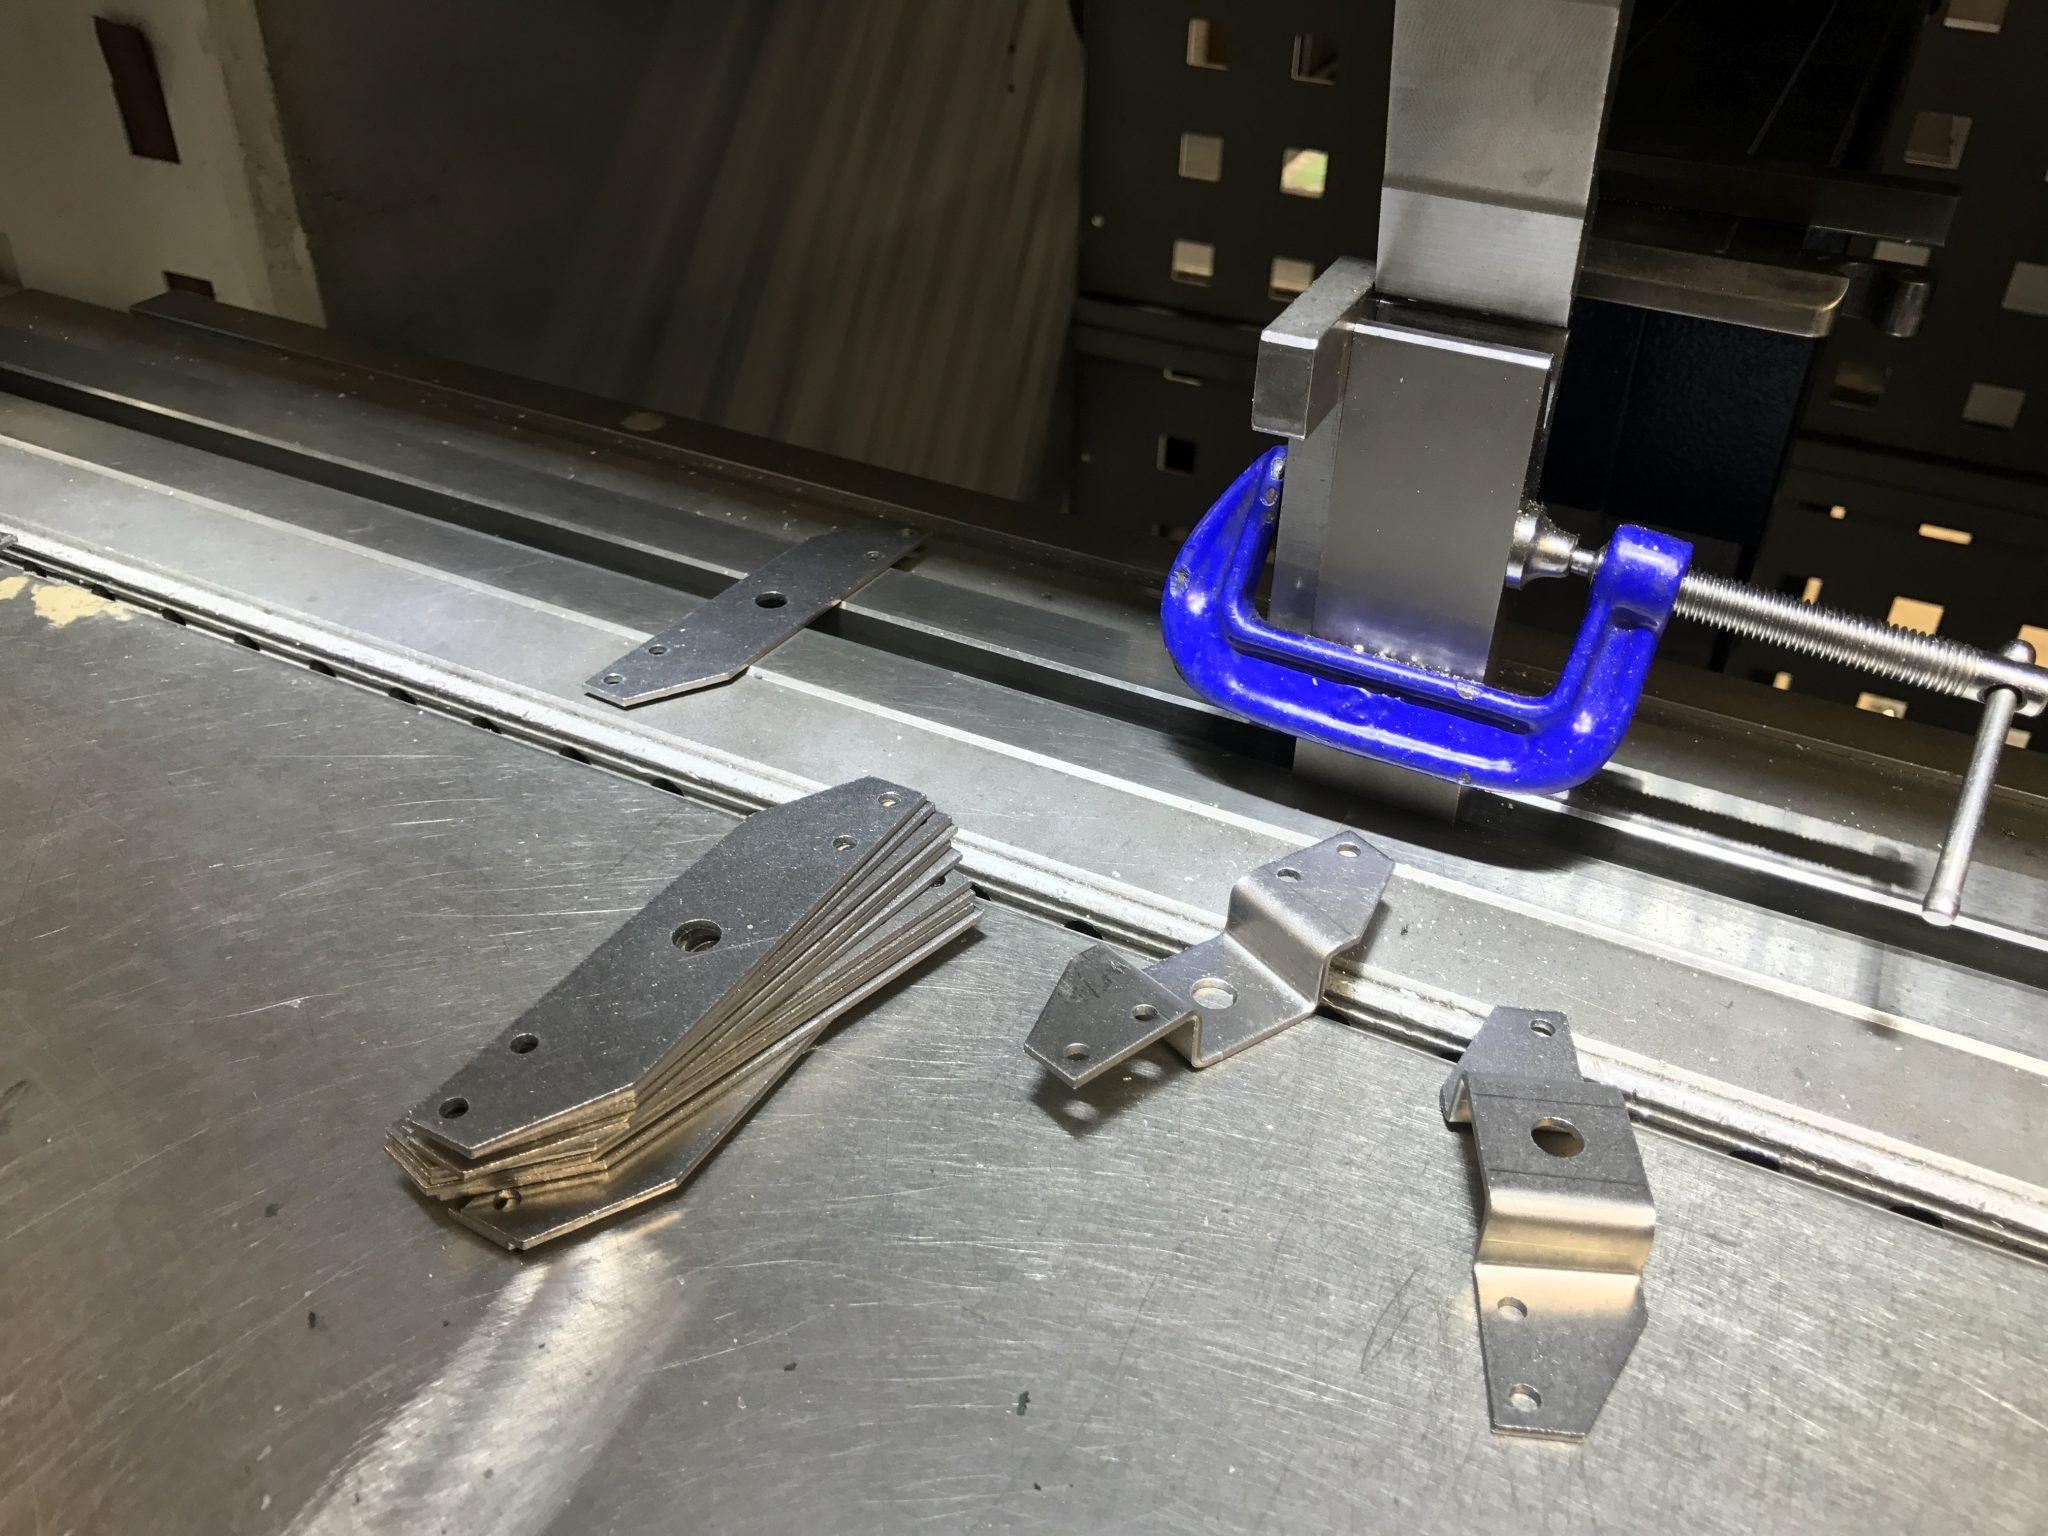 Sheet Metal Bending Using A Trumpf 7036 Cnc Press Brake